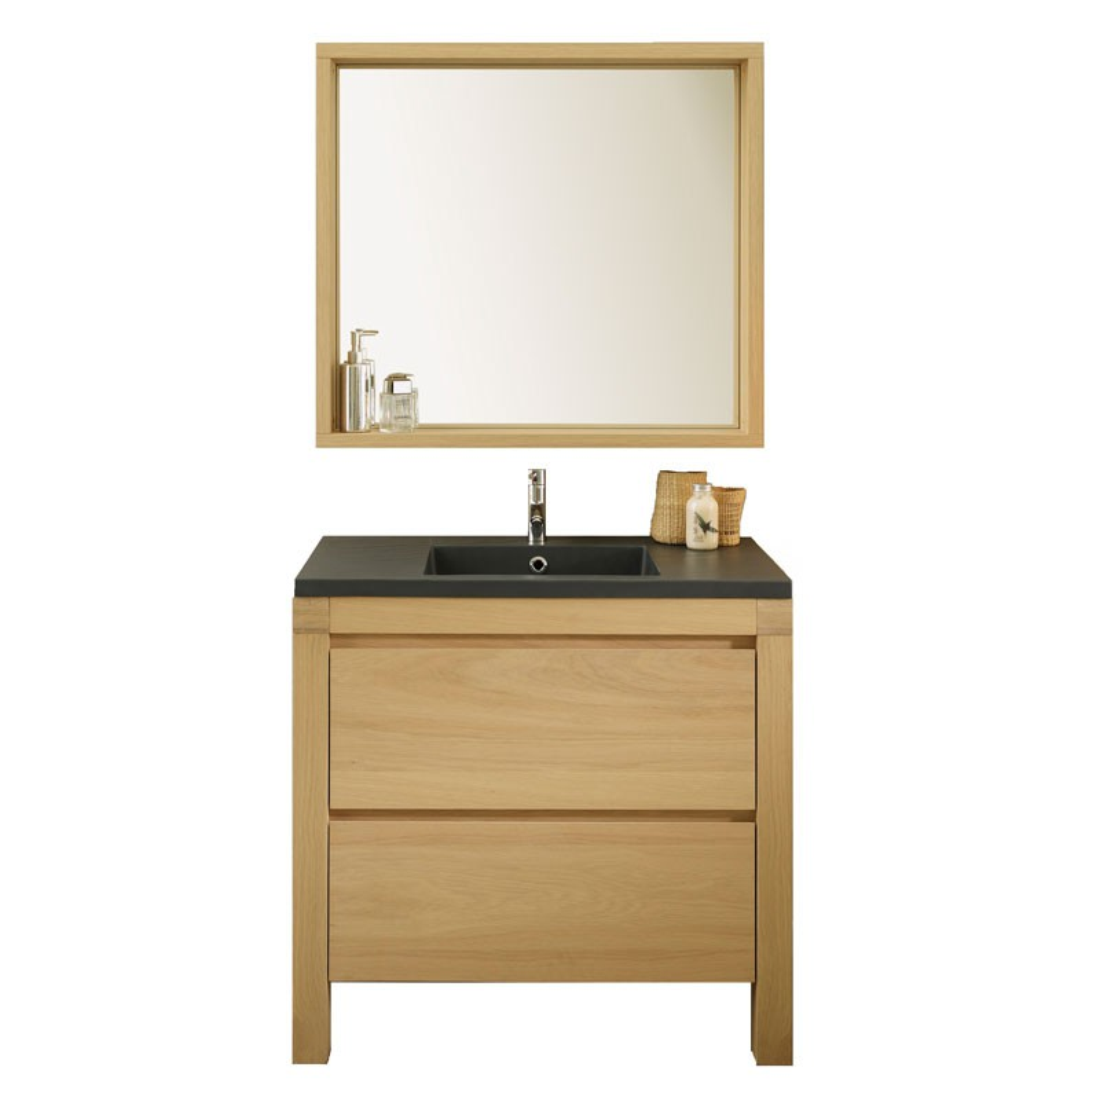 Meuble haut salle de bain avec miroir meuble salle de for Meuble de salle de bain avec vasque et miroir